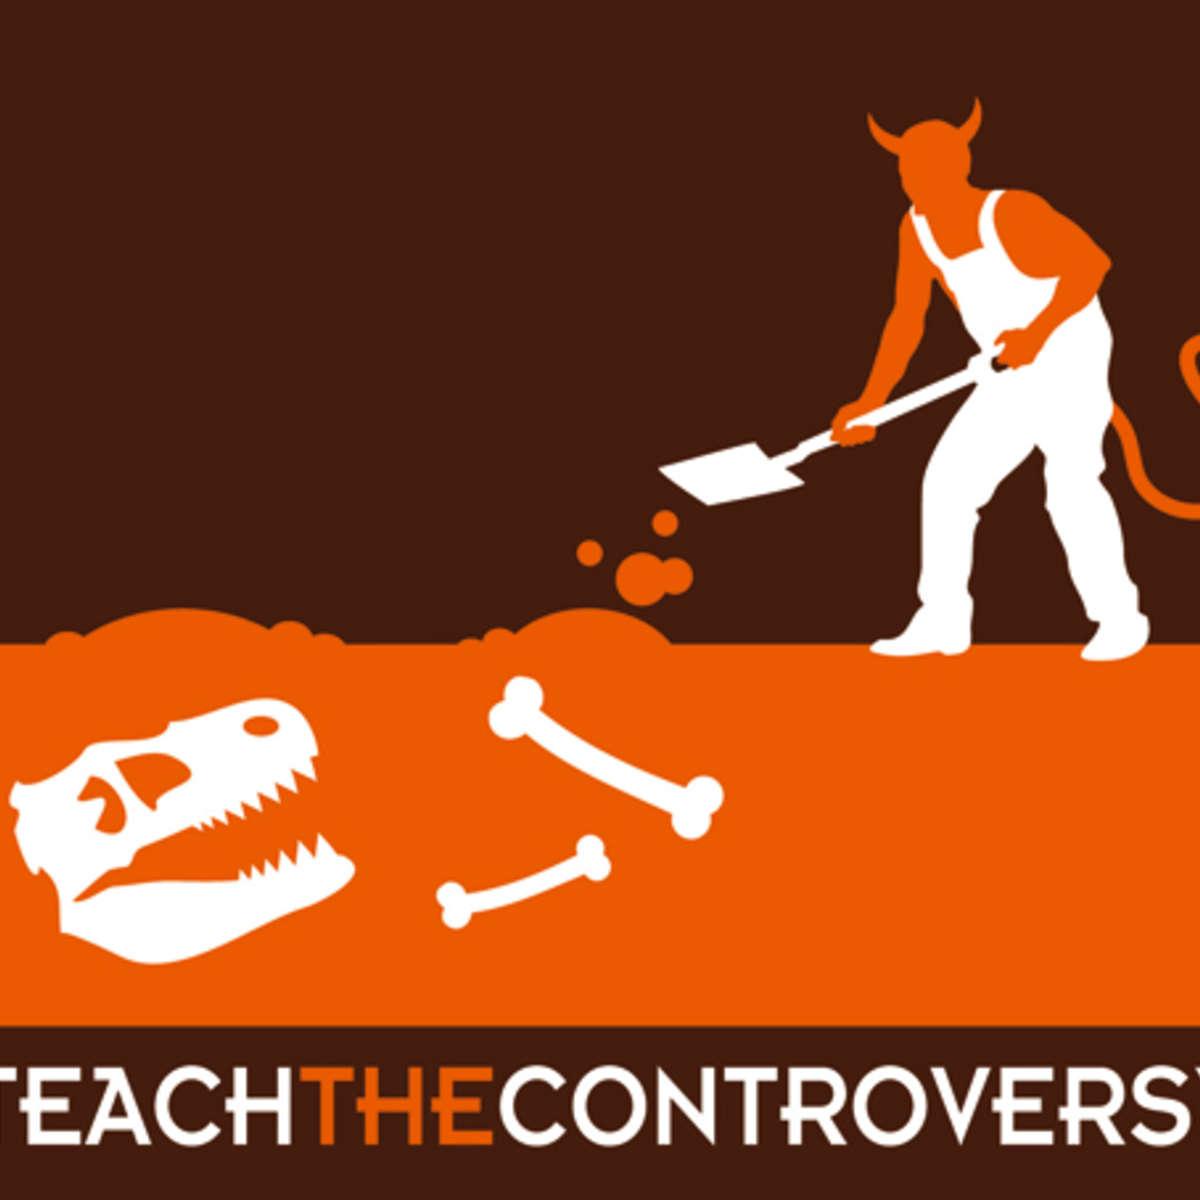 teachthecontroversy_devil_0.jpg